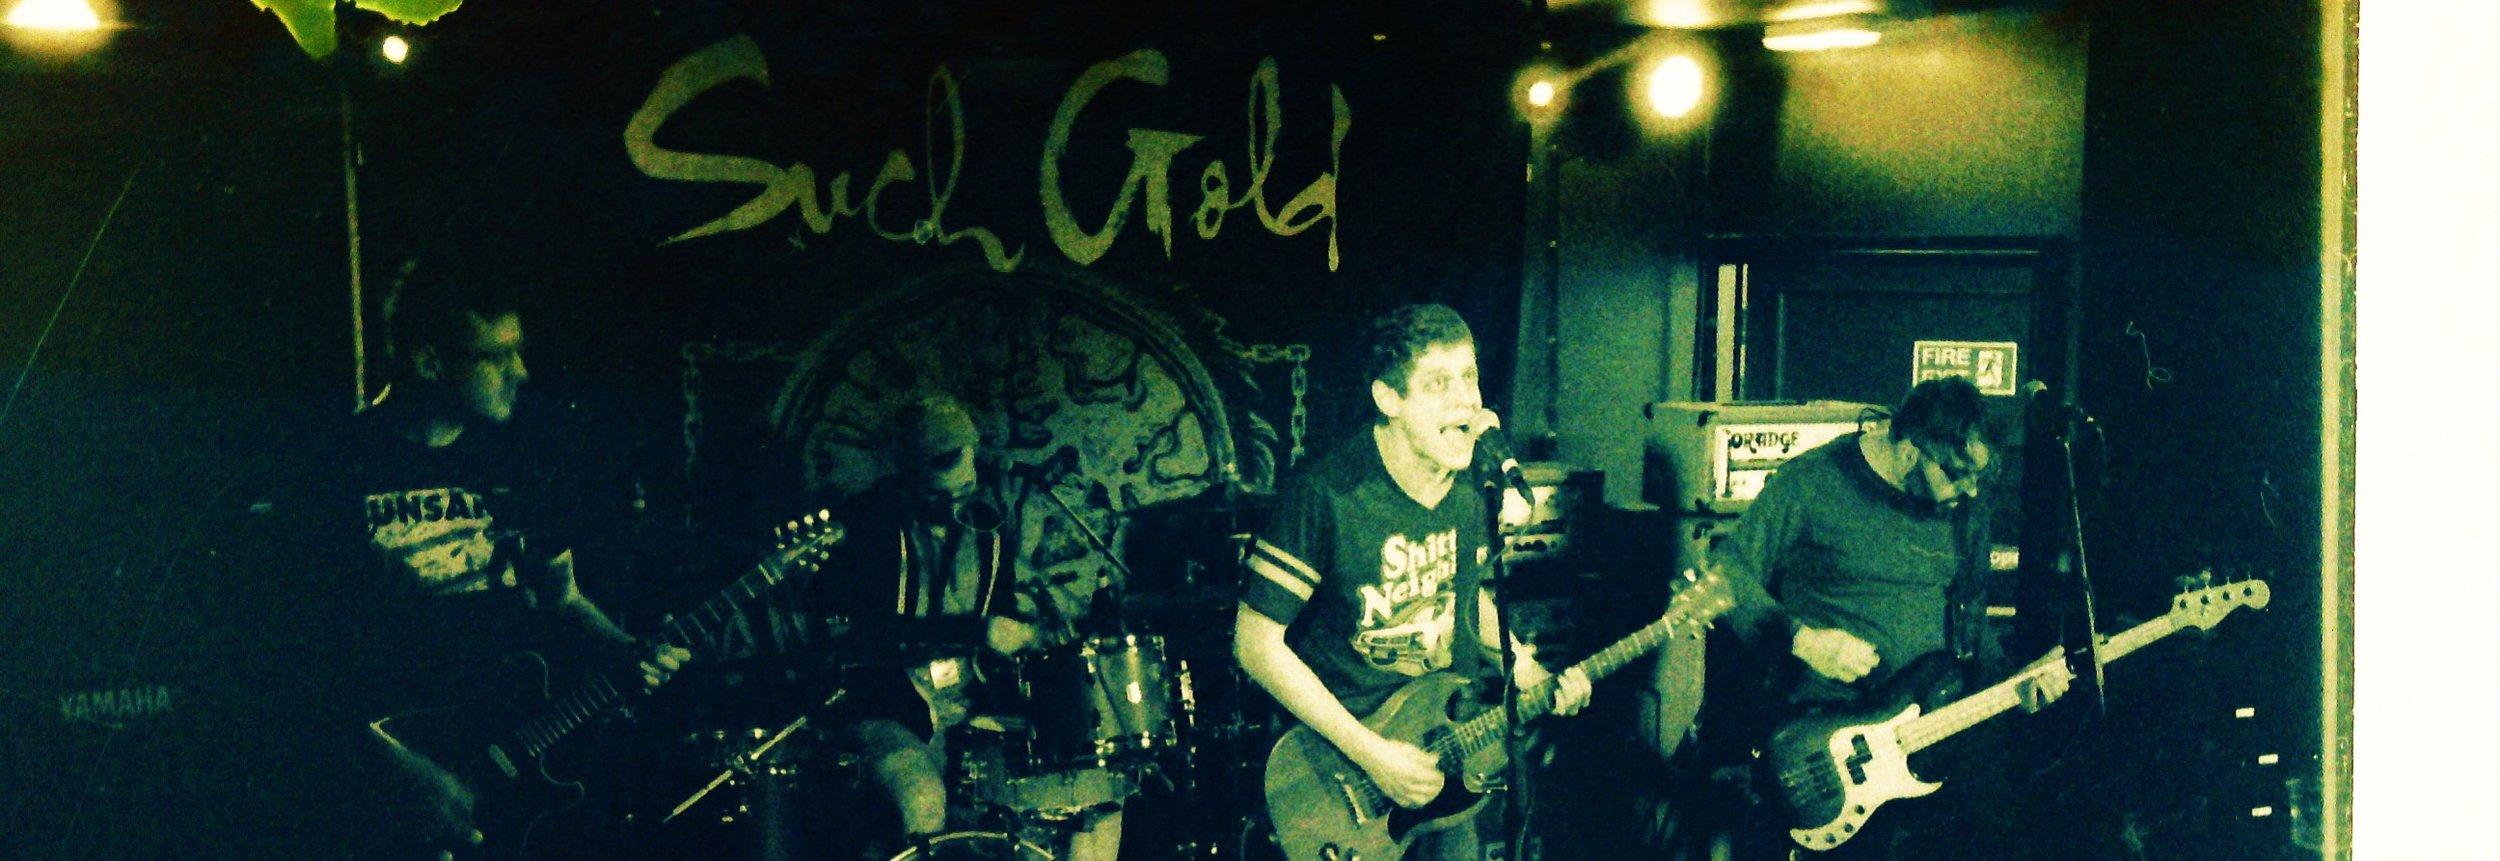 c-gold (38).JPG